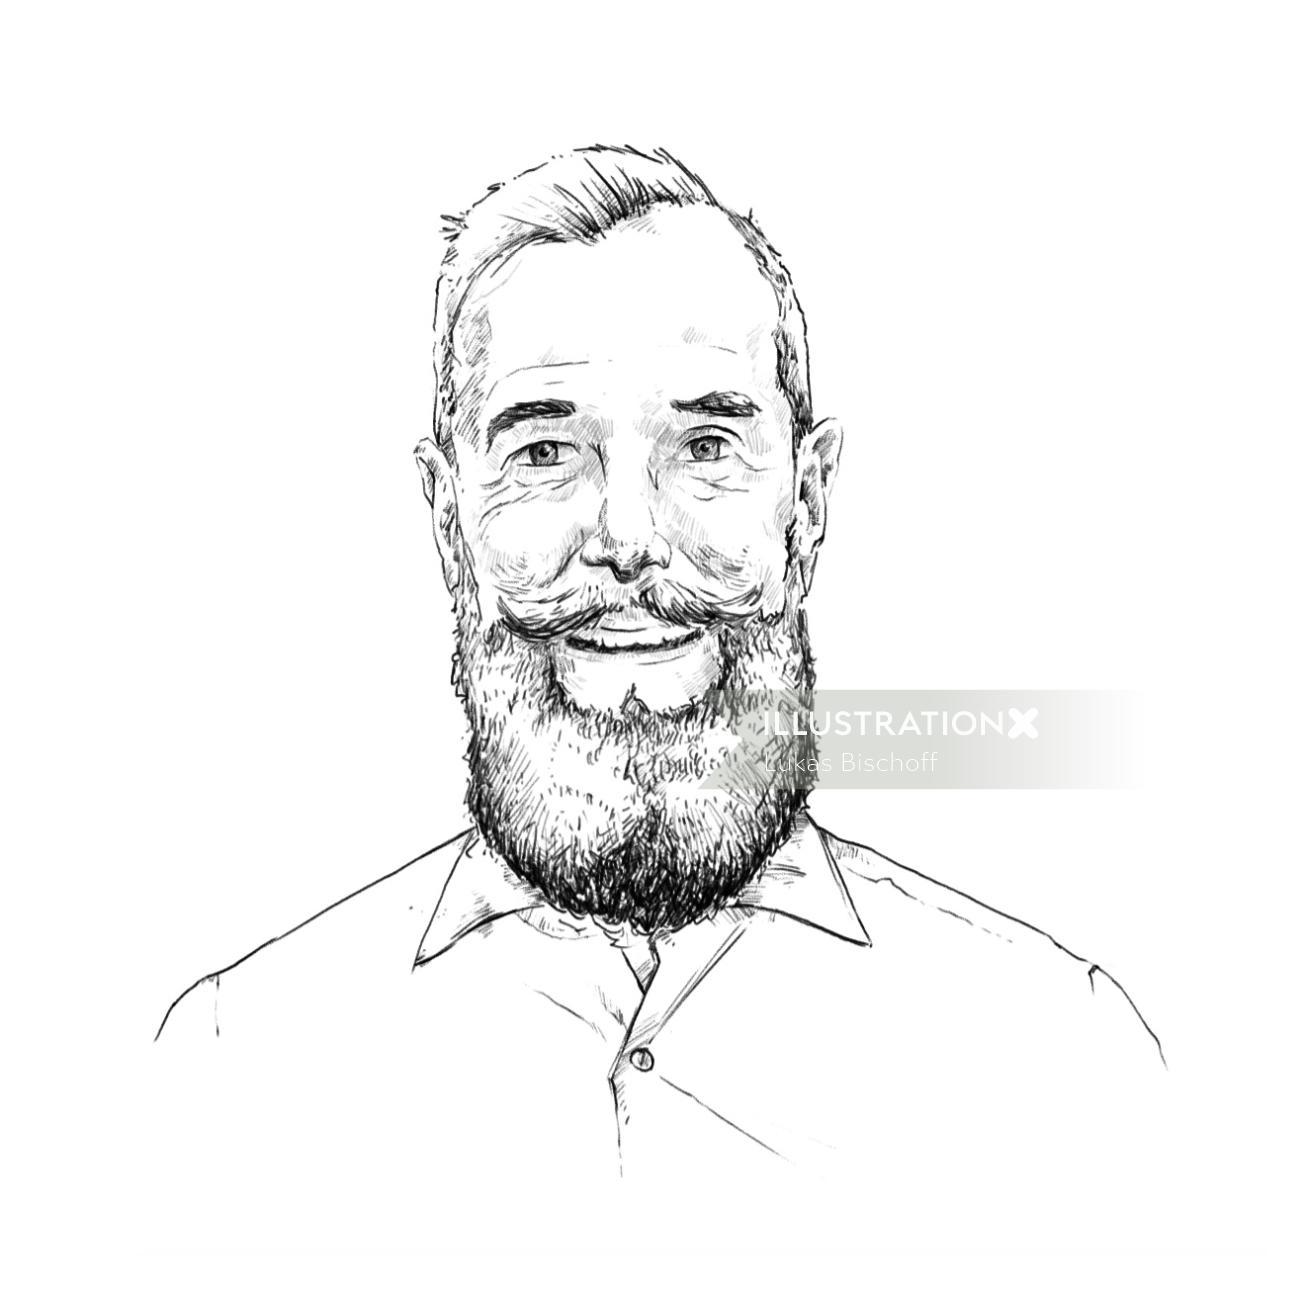 Beard man portrait art by Lukas Bischoff